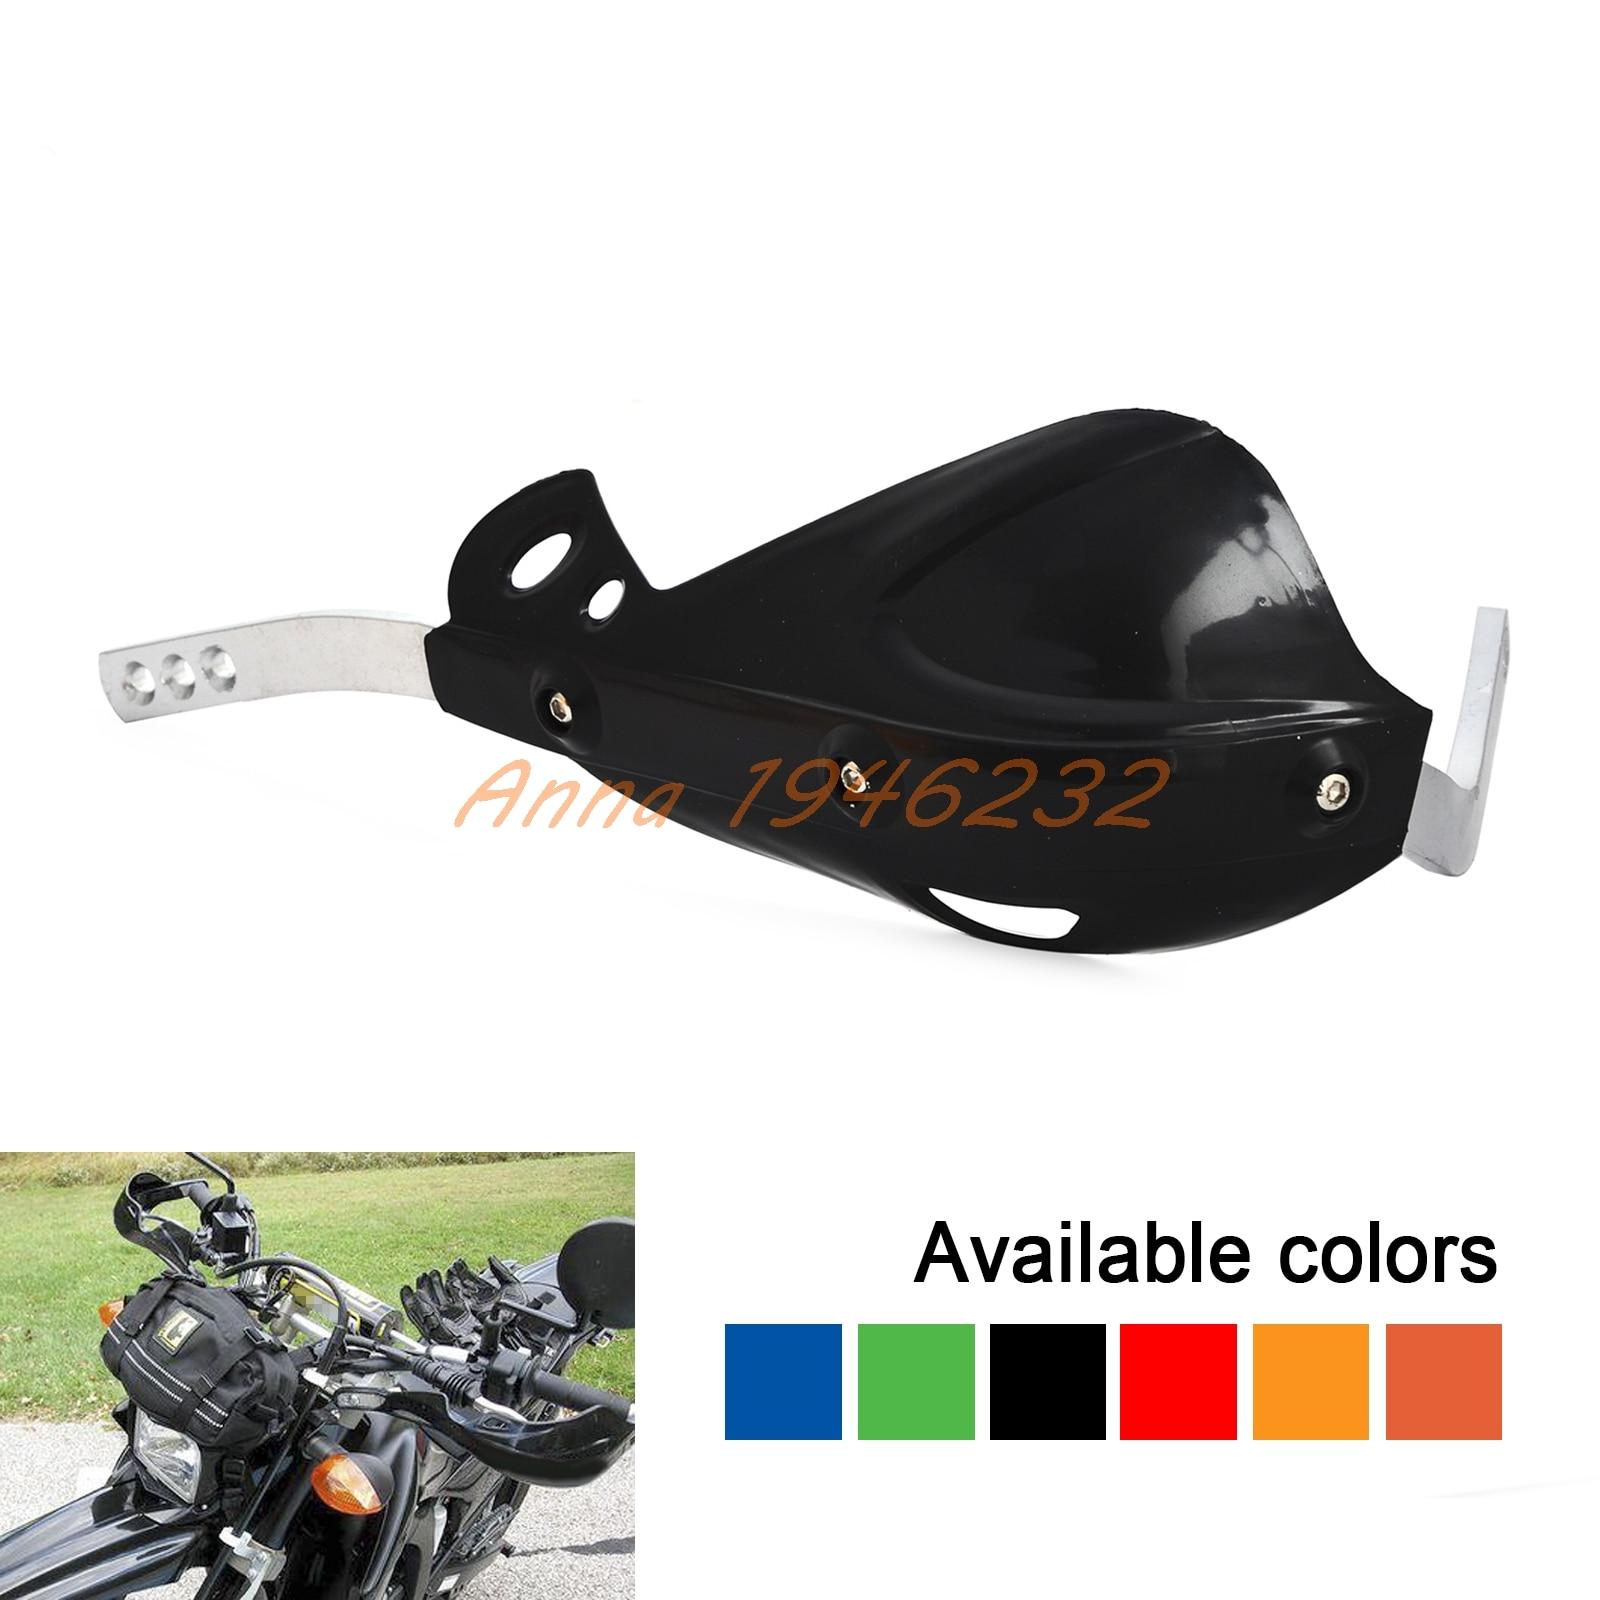 7/8 Motorcycle Dirt Bike ATV Brush Bar Hand Guard Handguard Protector For Honda Kawasai KTM Suzuki Yamaha Motorcross motorcycle brush bar hand guards handguard motorbike 7 8 22mm for kawasaki kxf 250 yamaha ktm yamaha raptor 700 honda f3